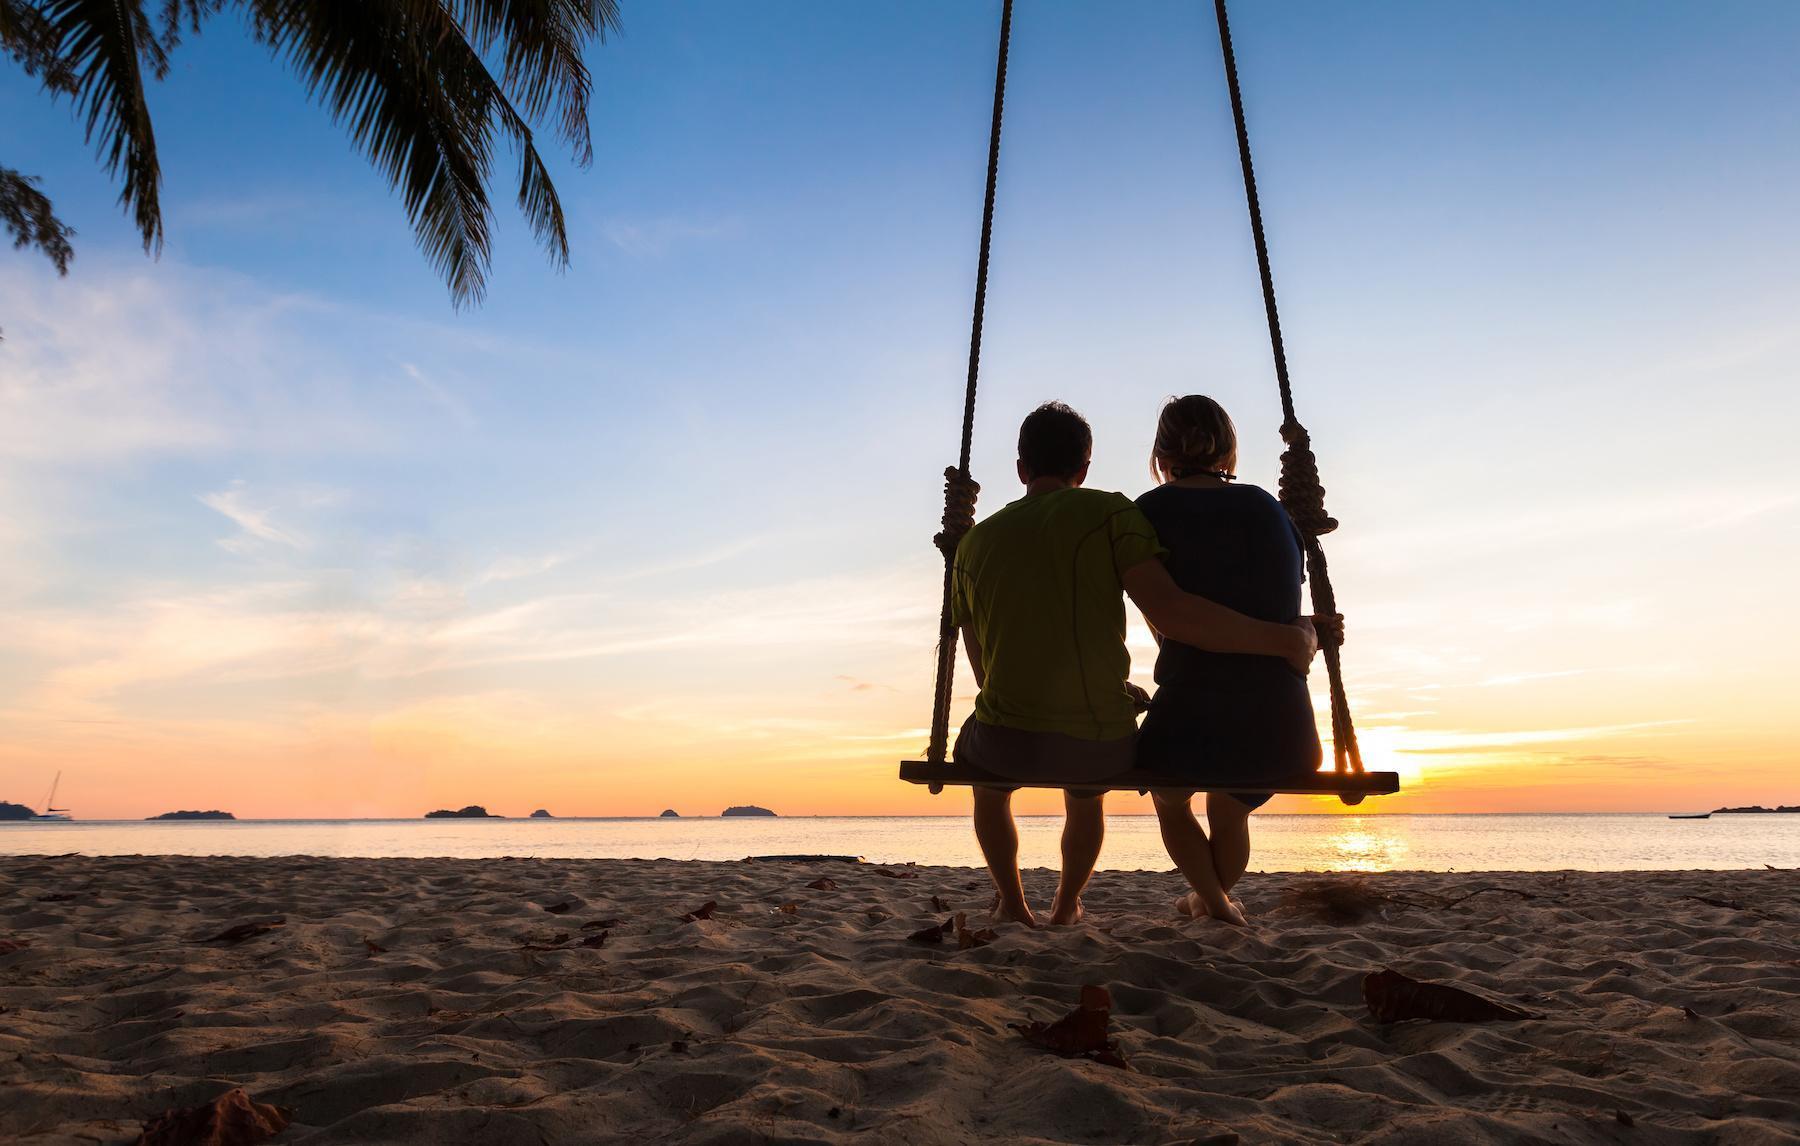 Couple on paradise beach resort sharing honeymoon